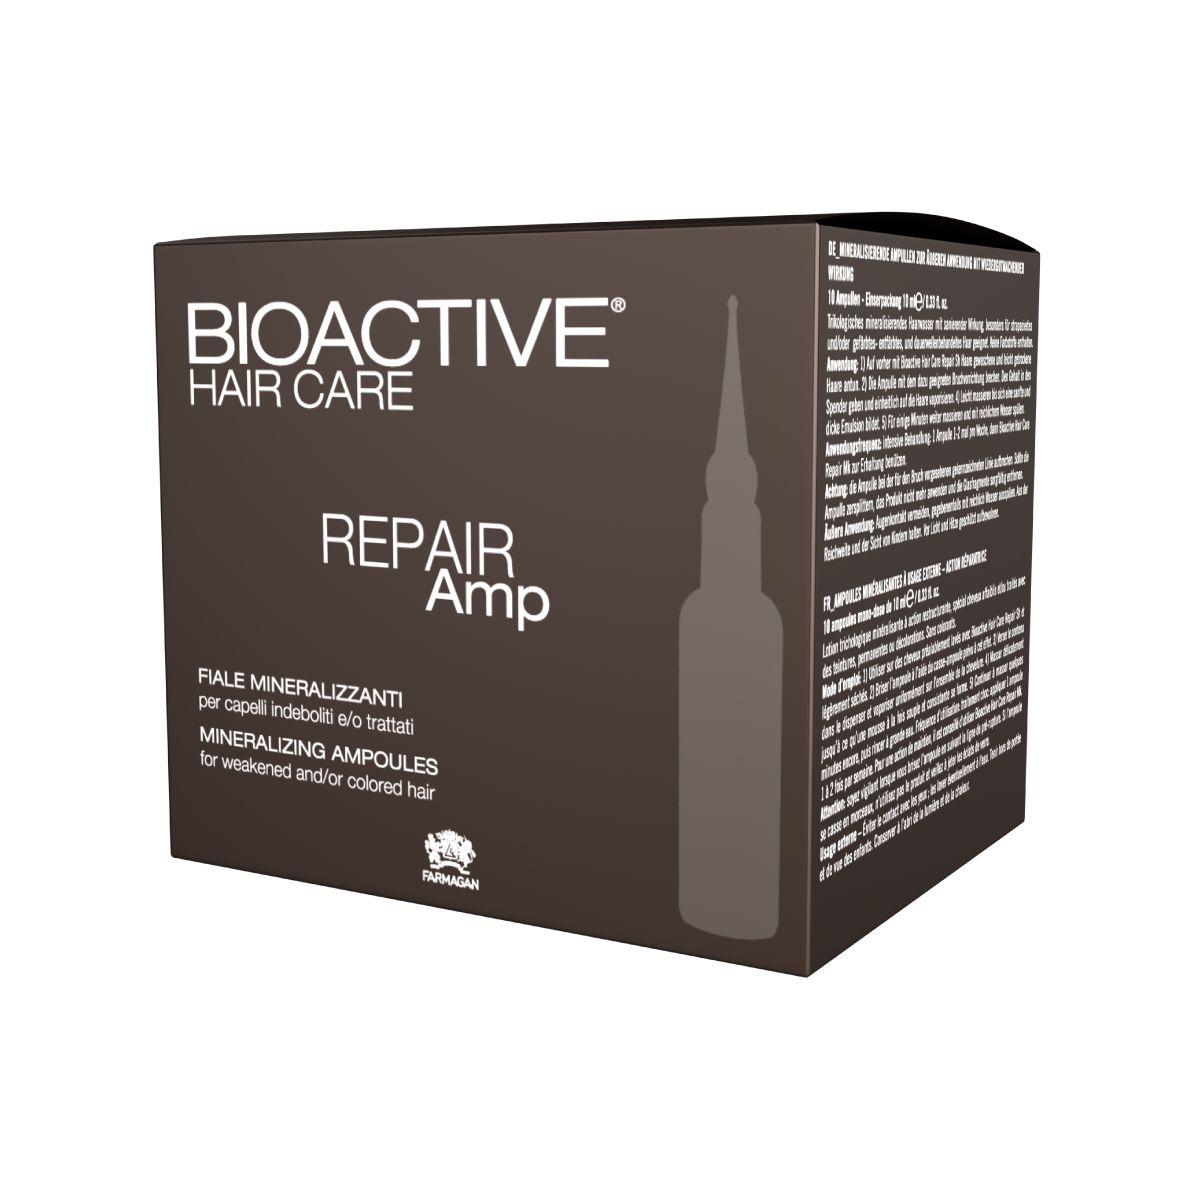 Bioactive Hair Care Repair Amp Mineralizing Ampoules Odbudowujace Ampulki Do Wlosow Cena Opinie Recenzja Kwc